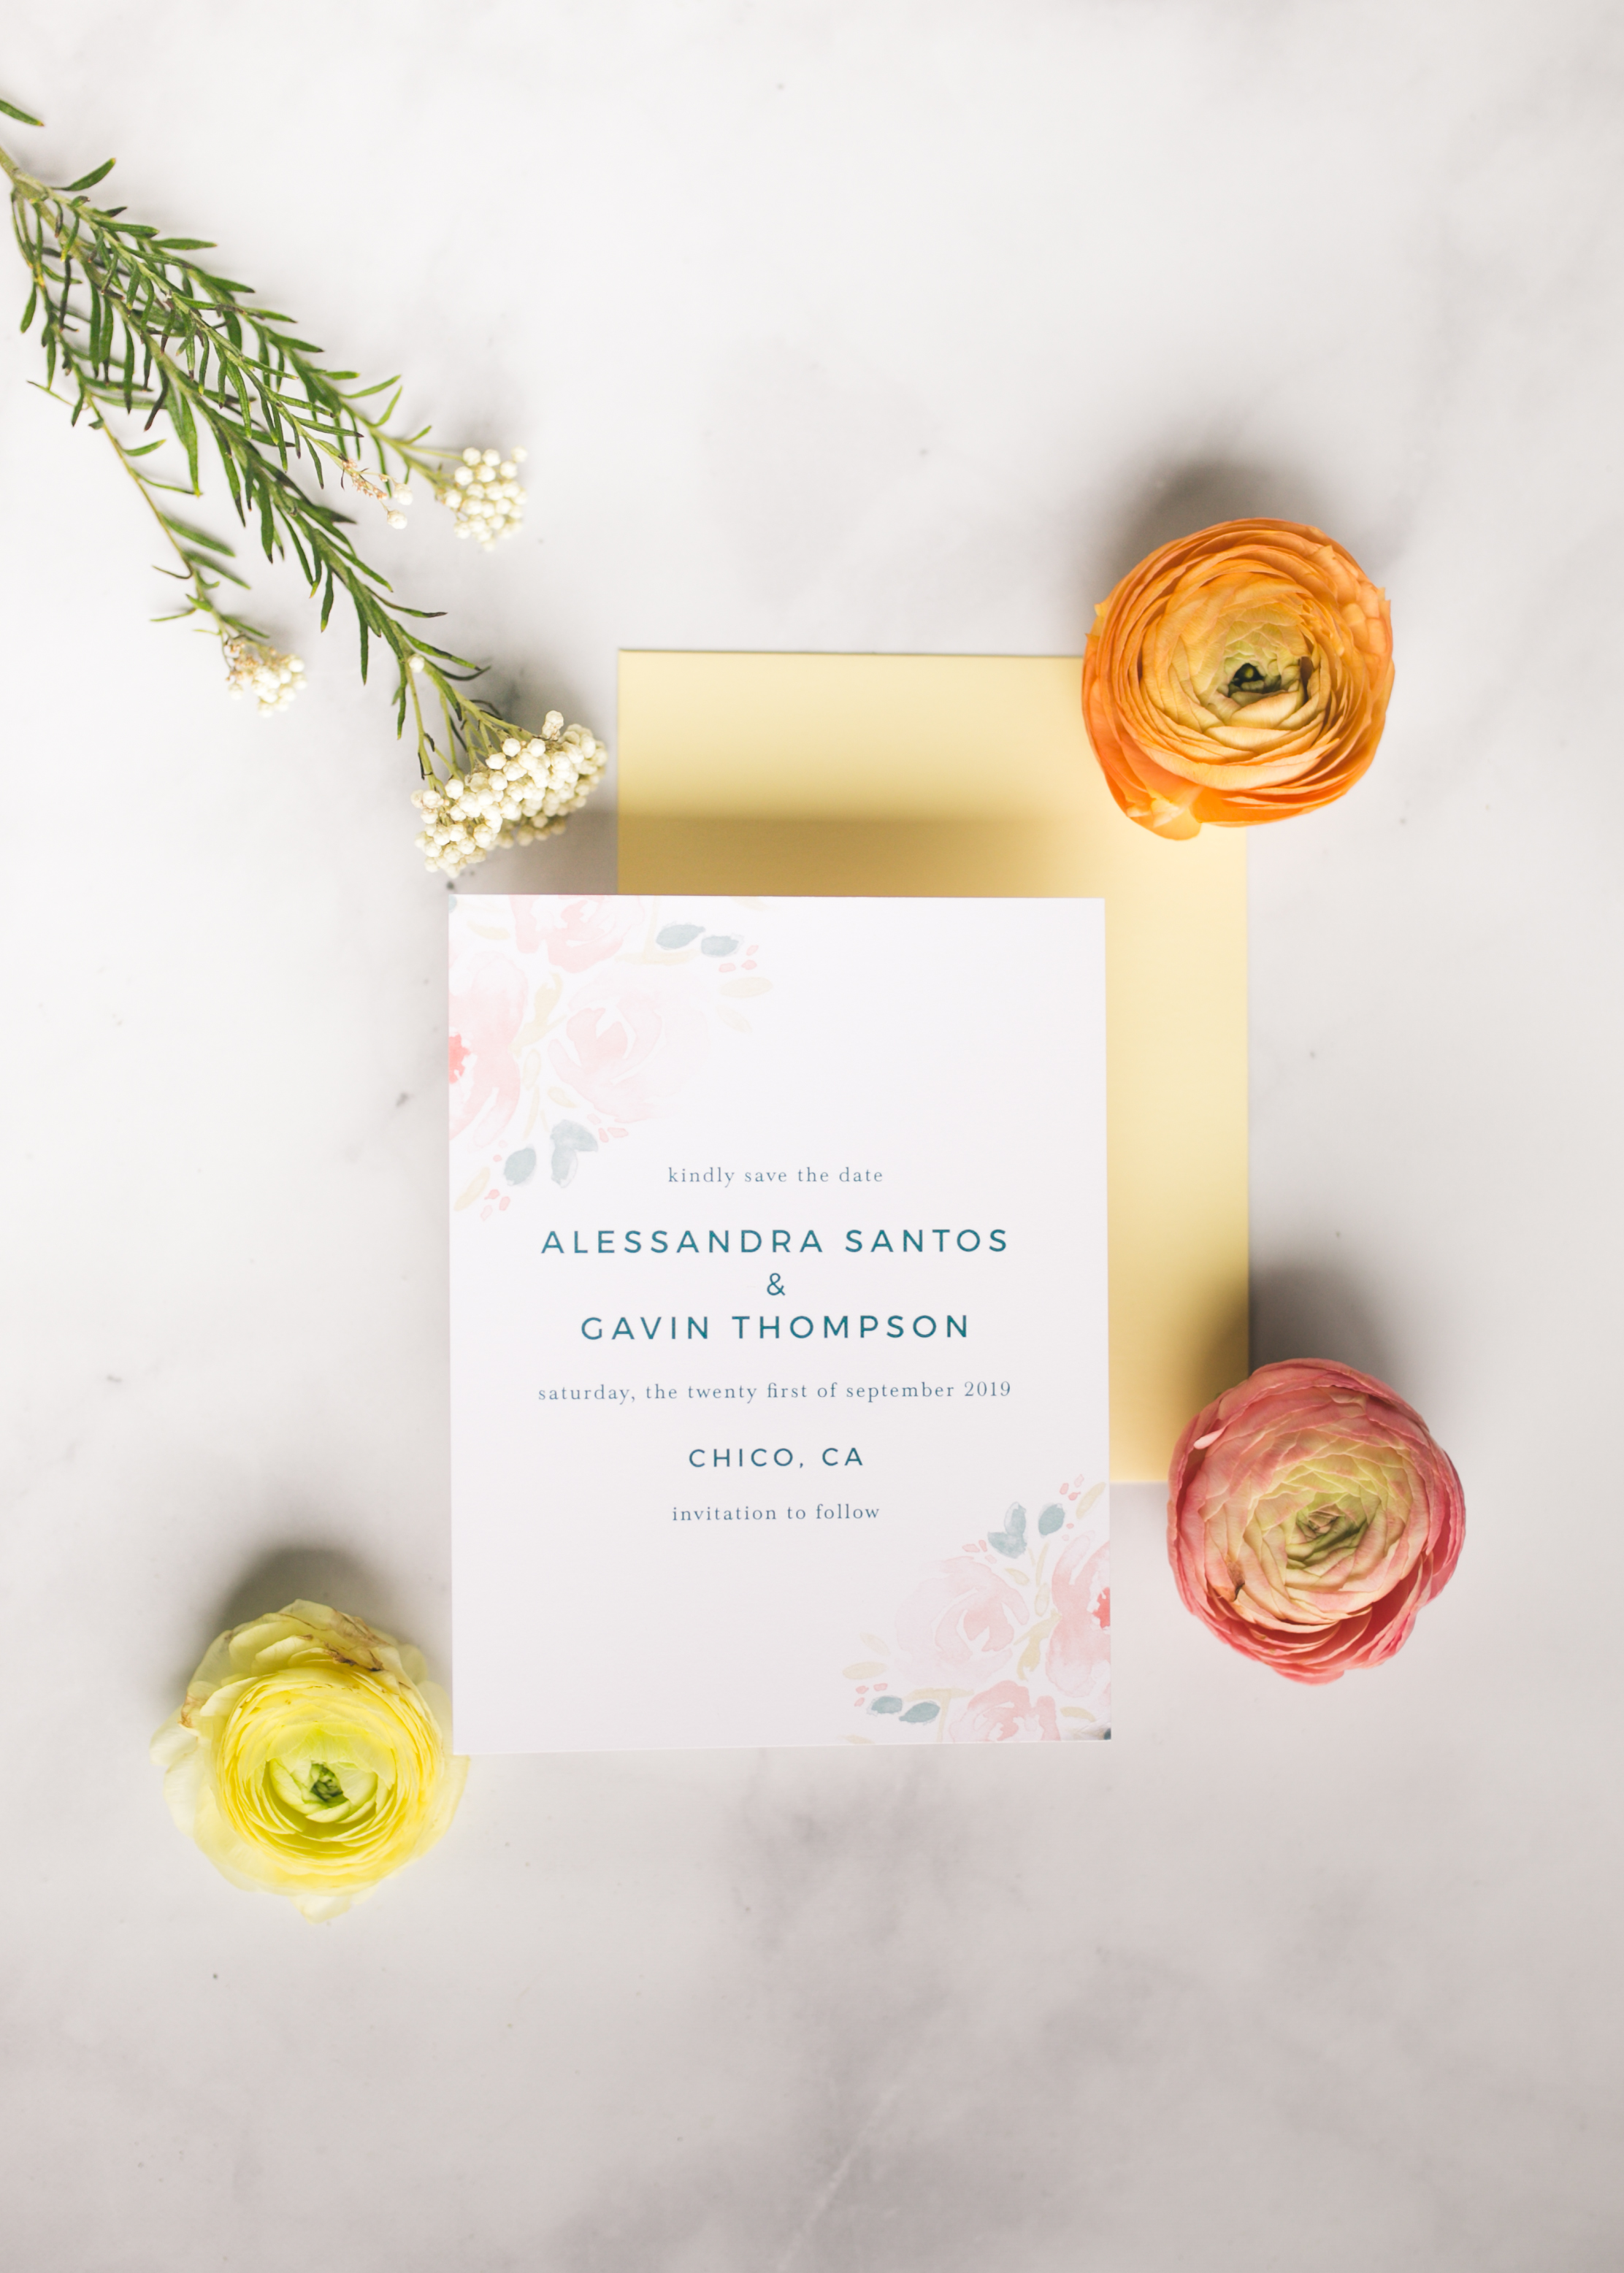 basic-invite-save-the-date-wedding.jpg